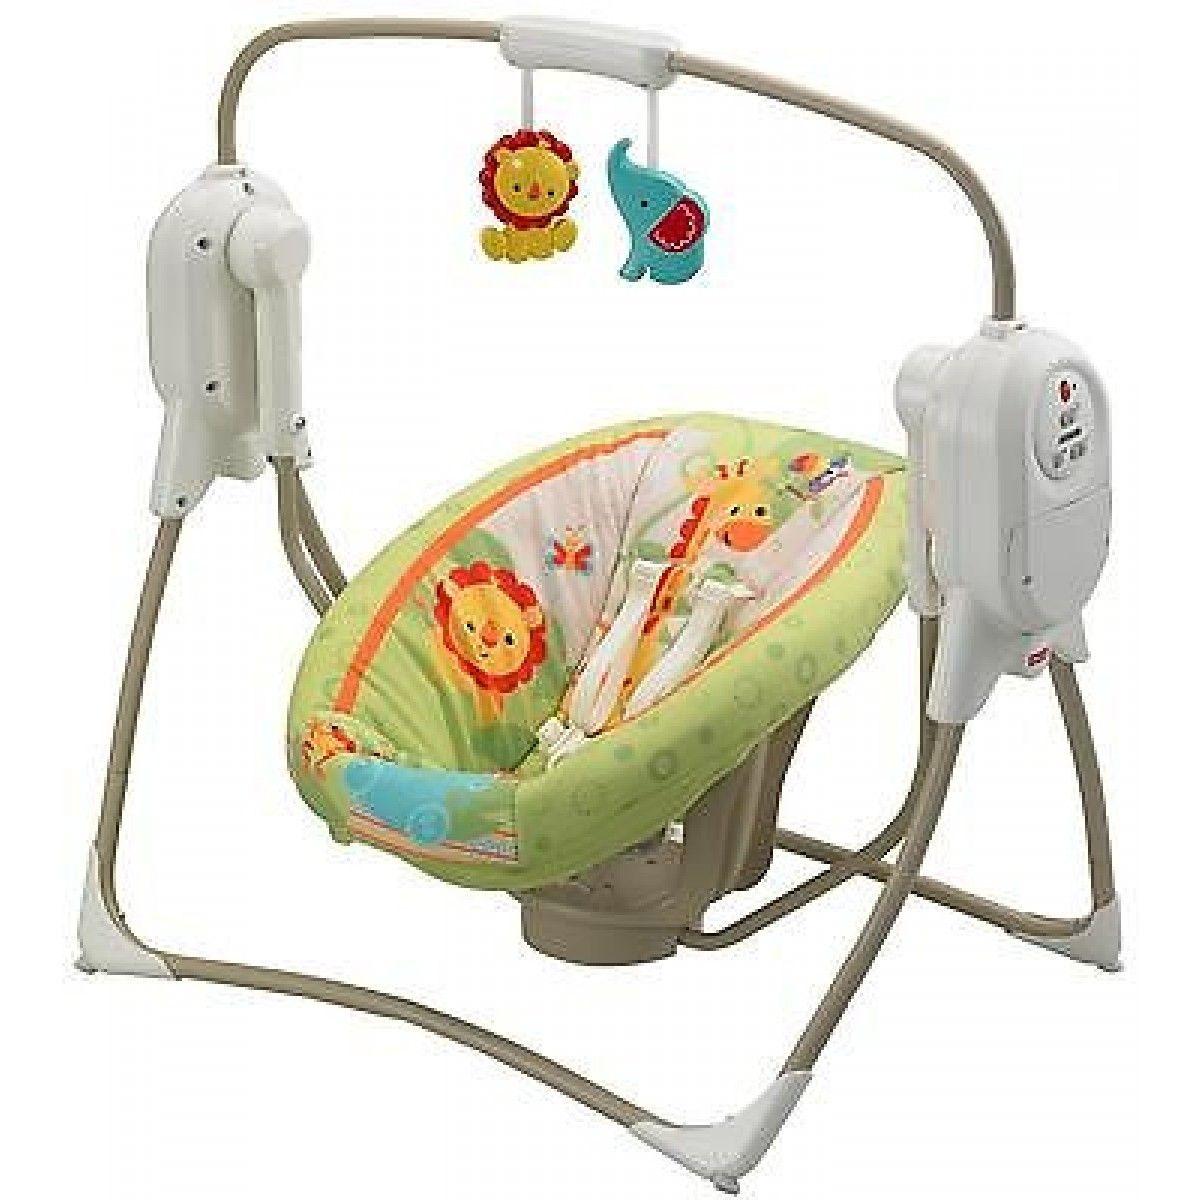 fisherprice rainforest portable baby swing  buy toys and baby swings - fisherprice rainforest portable baby swing